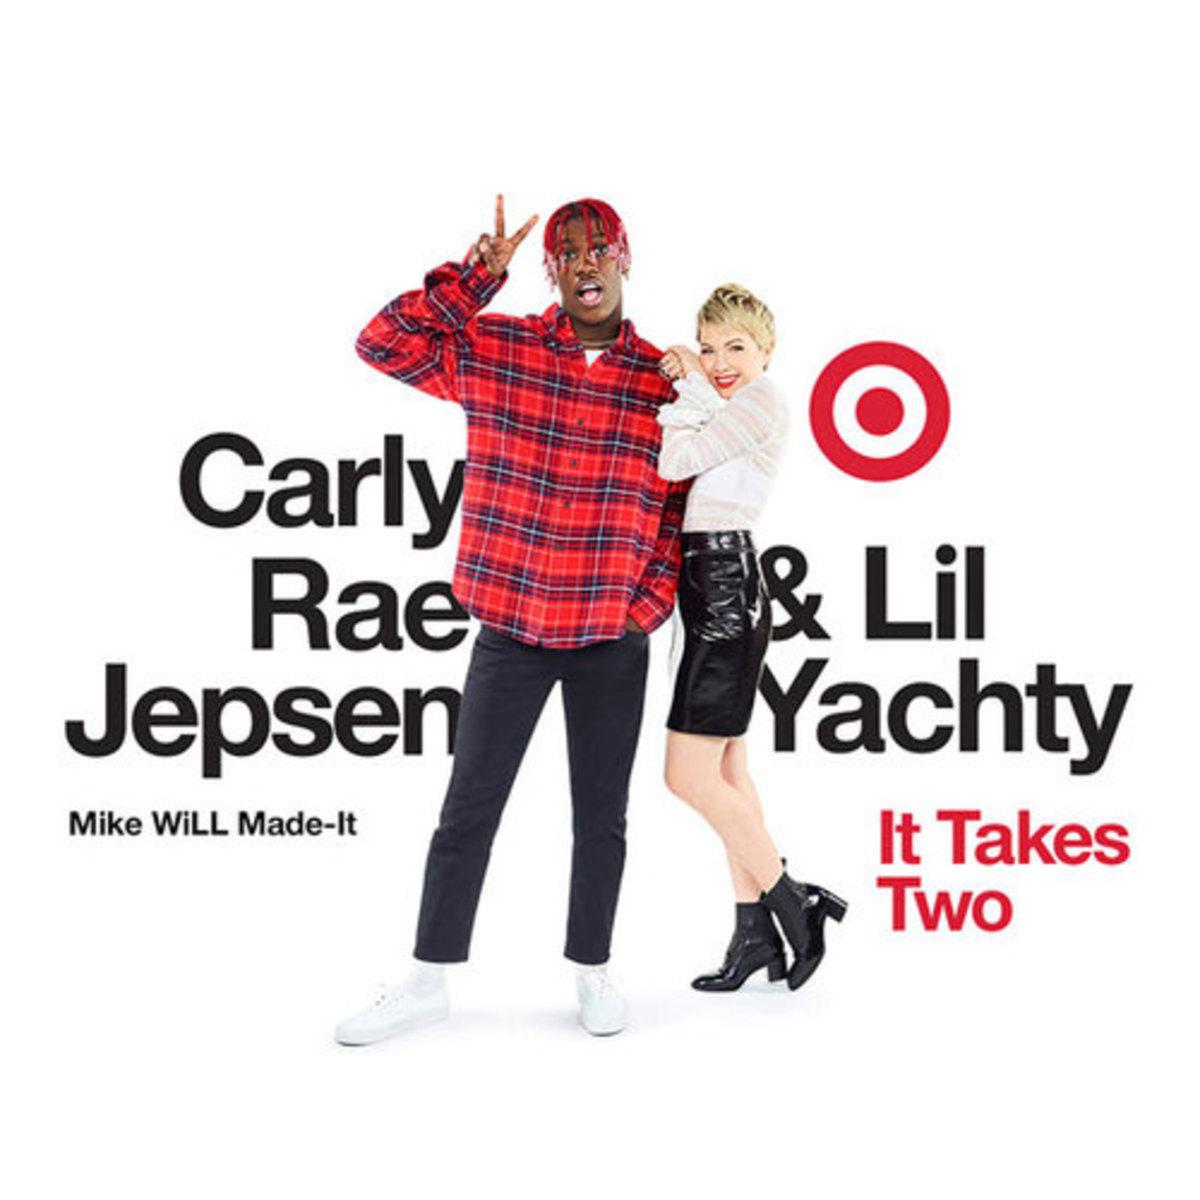 carly-rae-jepsen-lil-yachty-it-takes-two.jpg